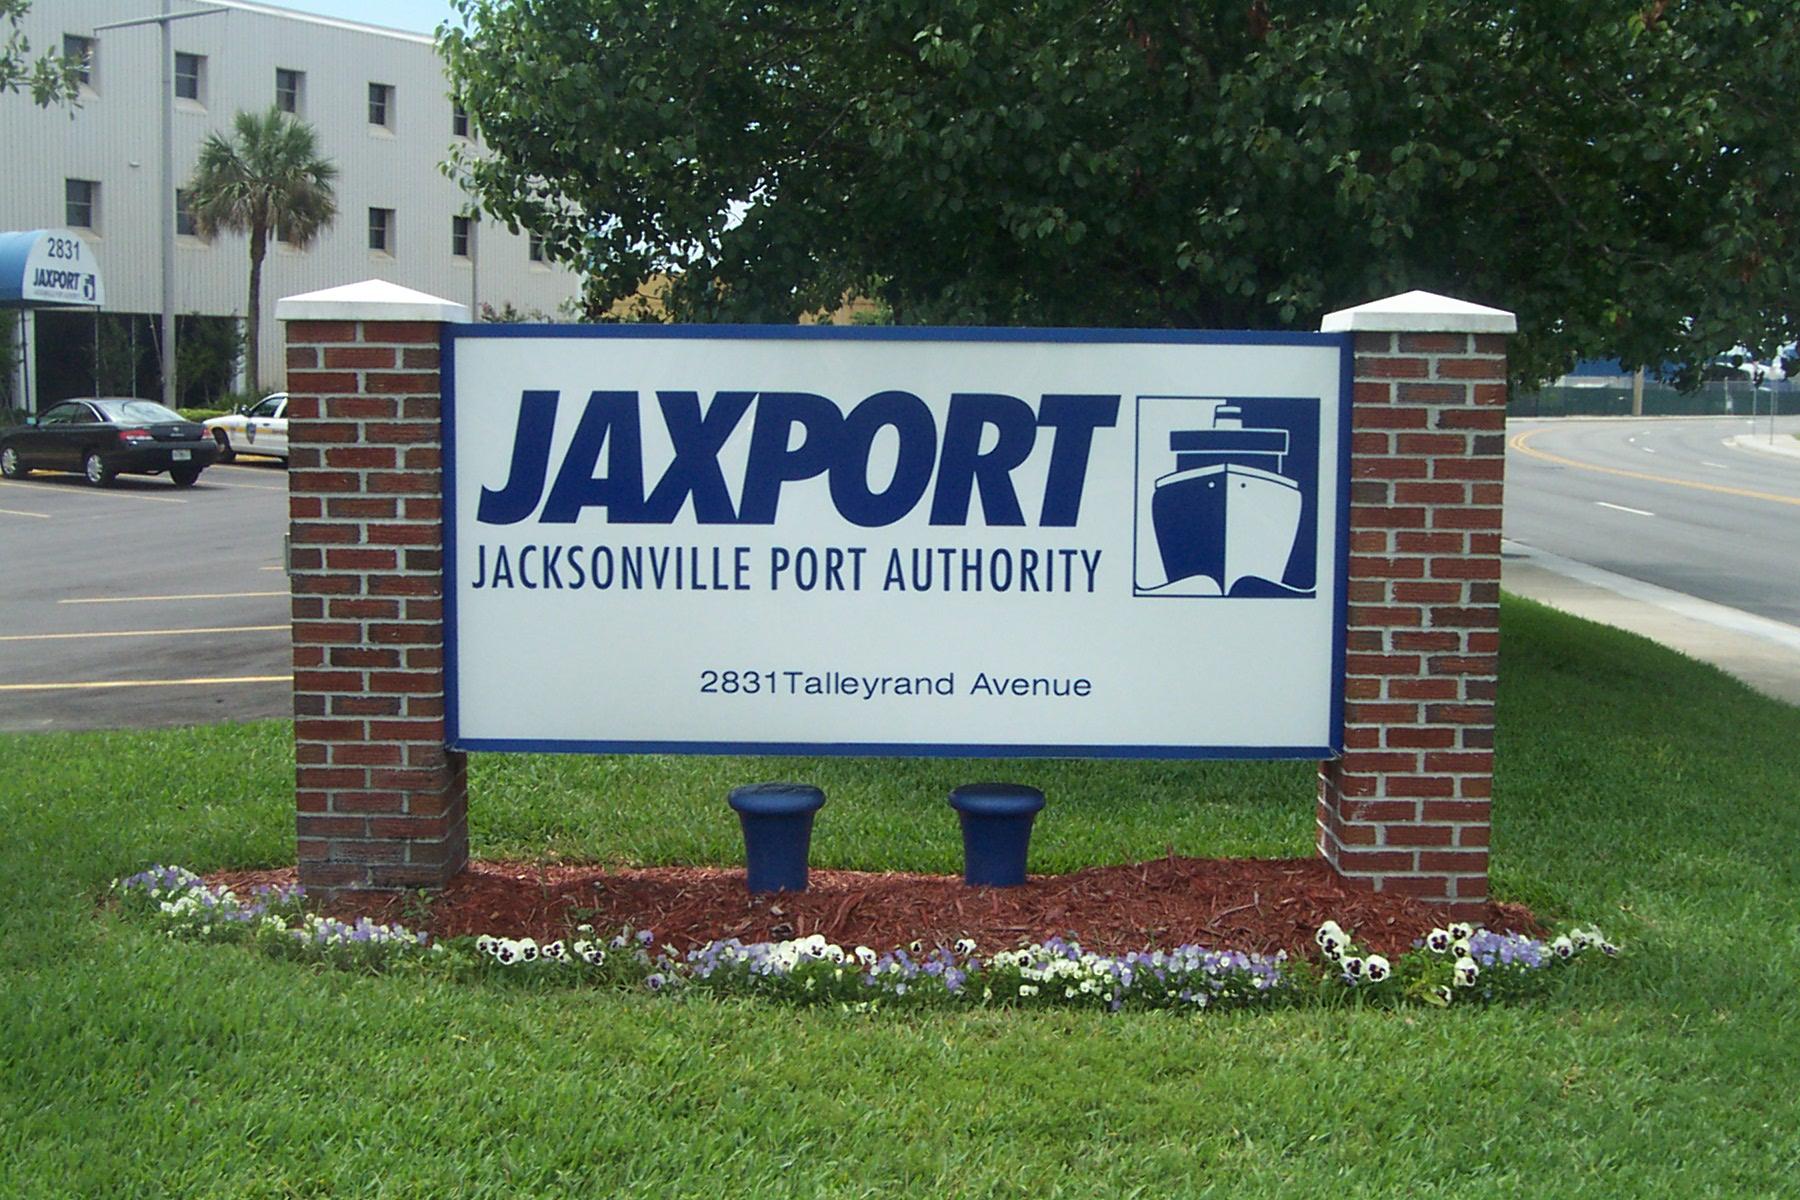 jaxport-monument-sign.jpg